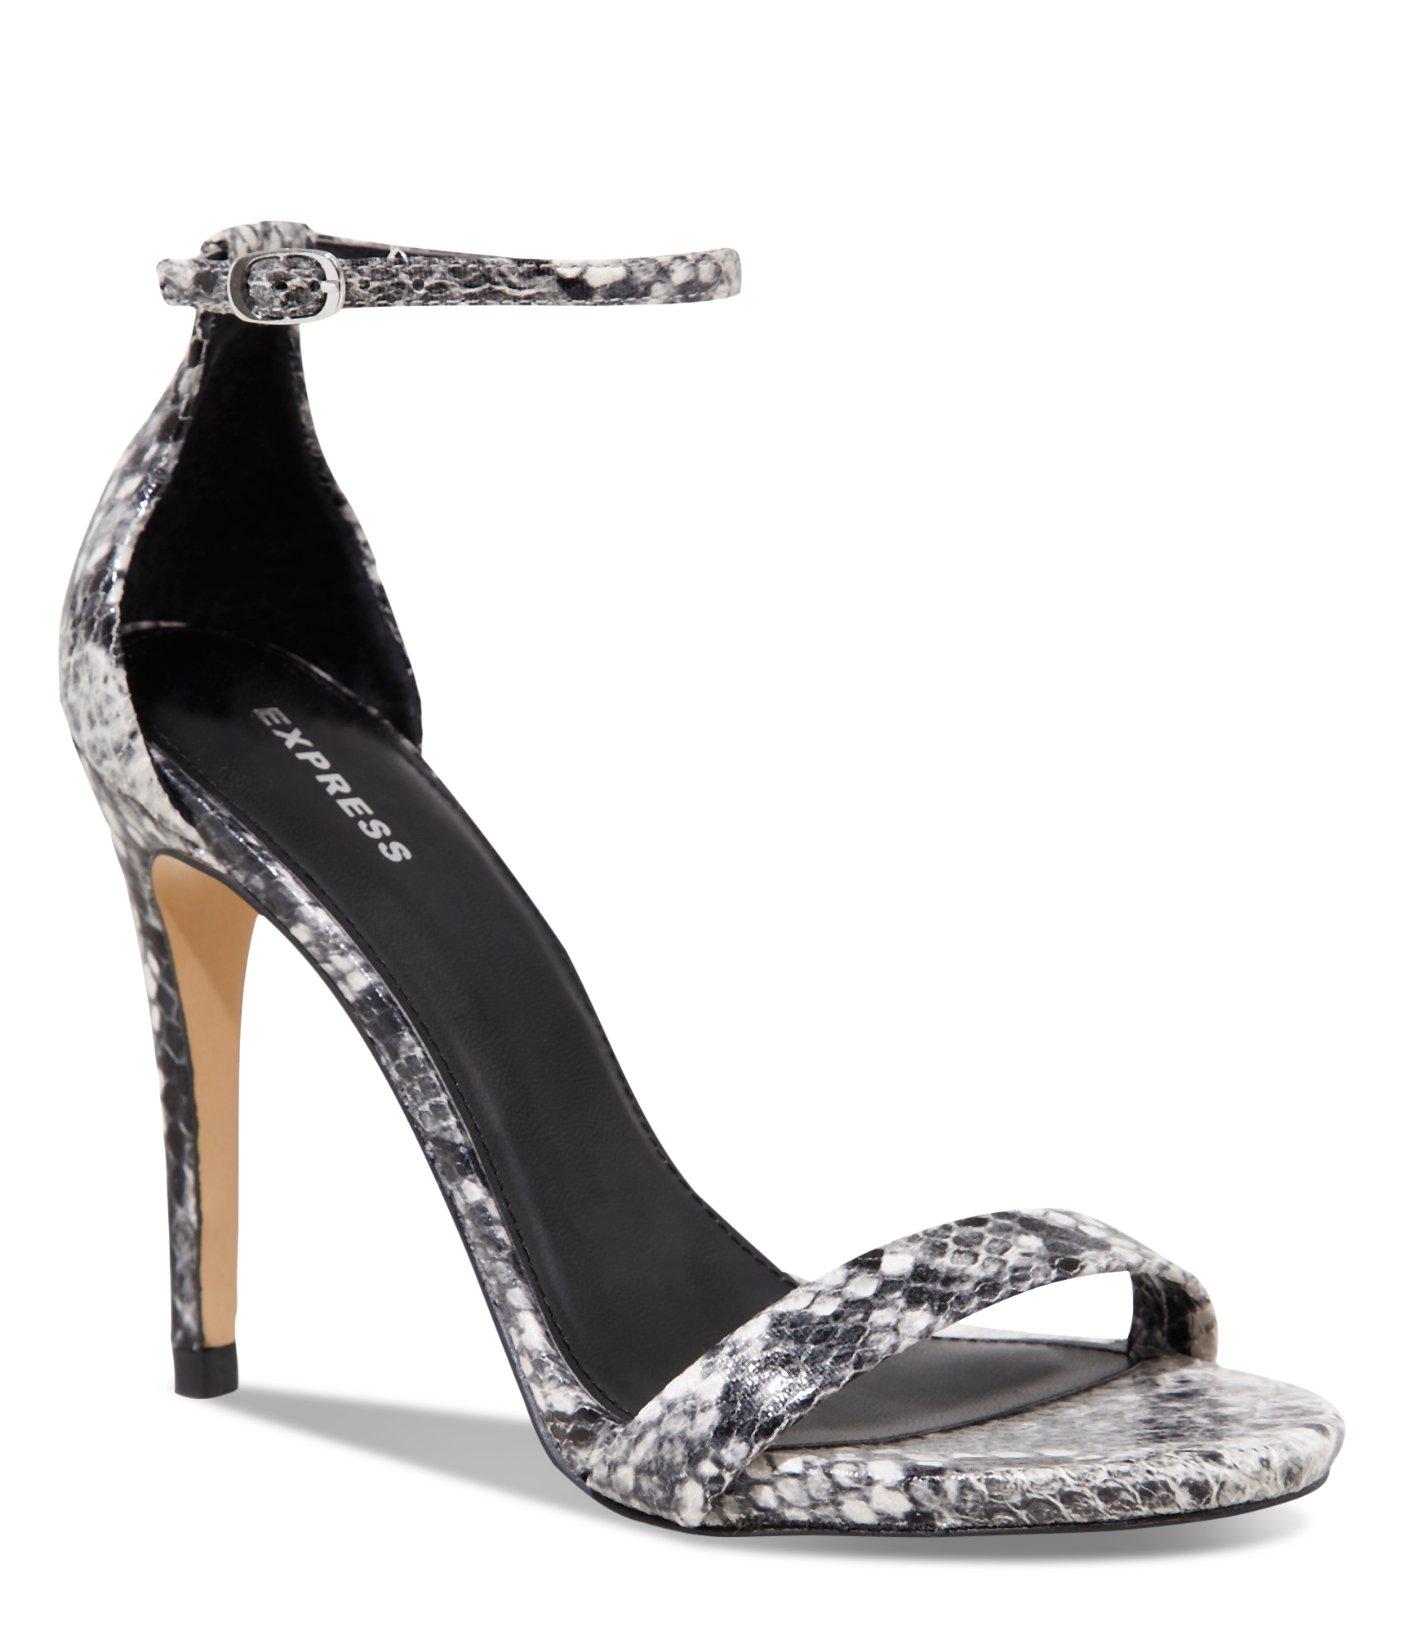 320037f7520 Lyst - Express Snakeskin Print Heeled Runway Sandal